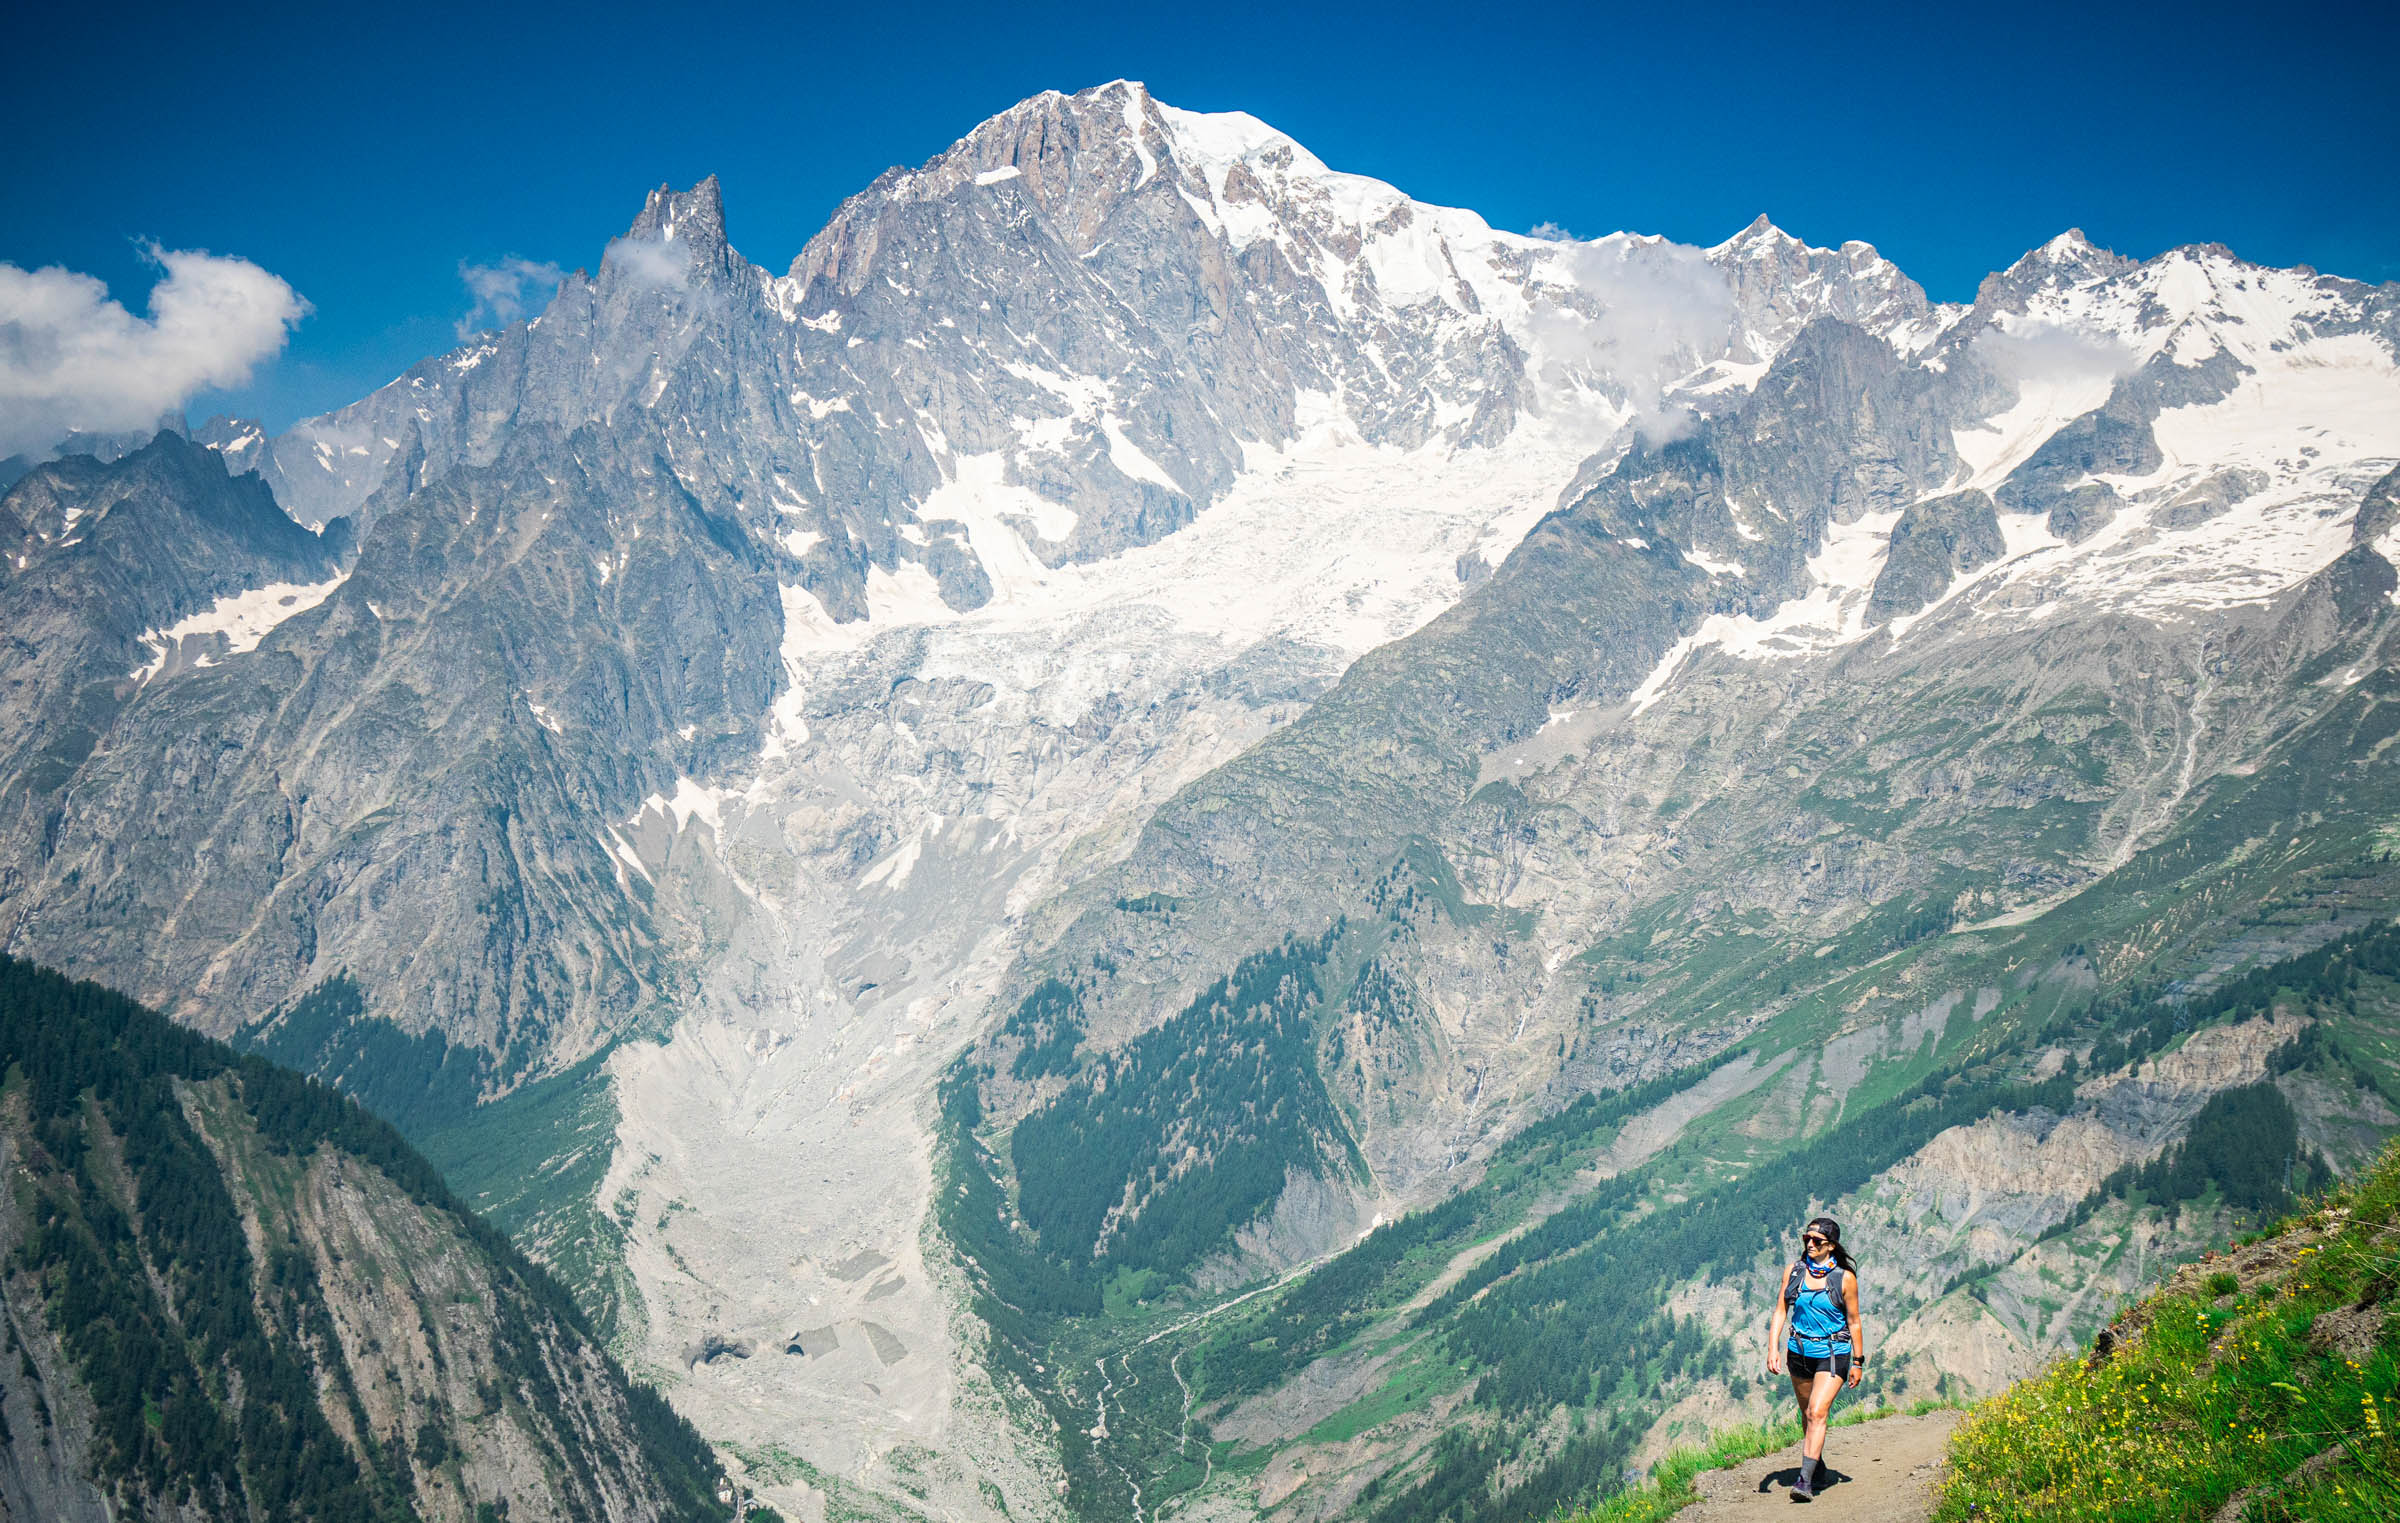 Jen Ator hiking in mountains